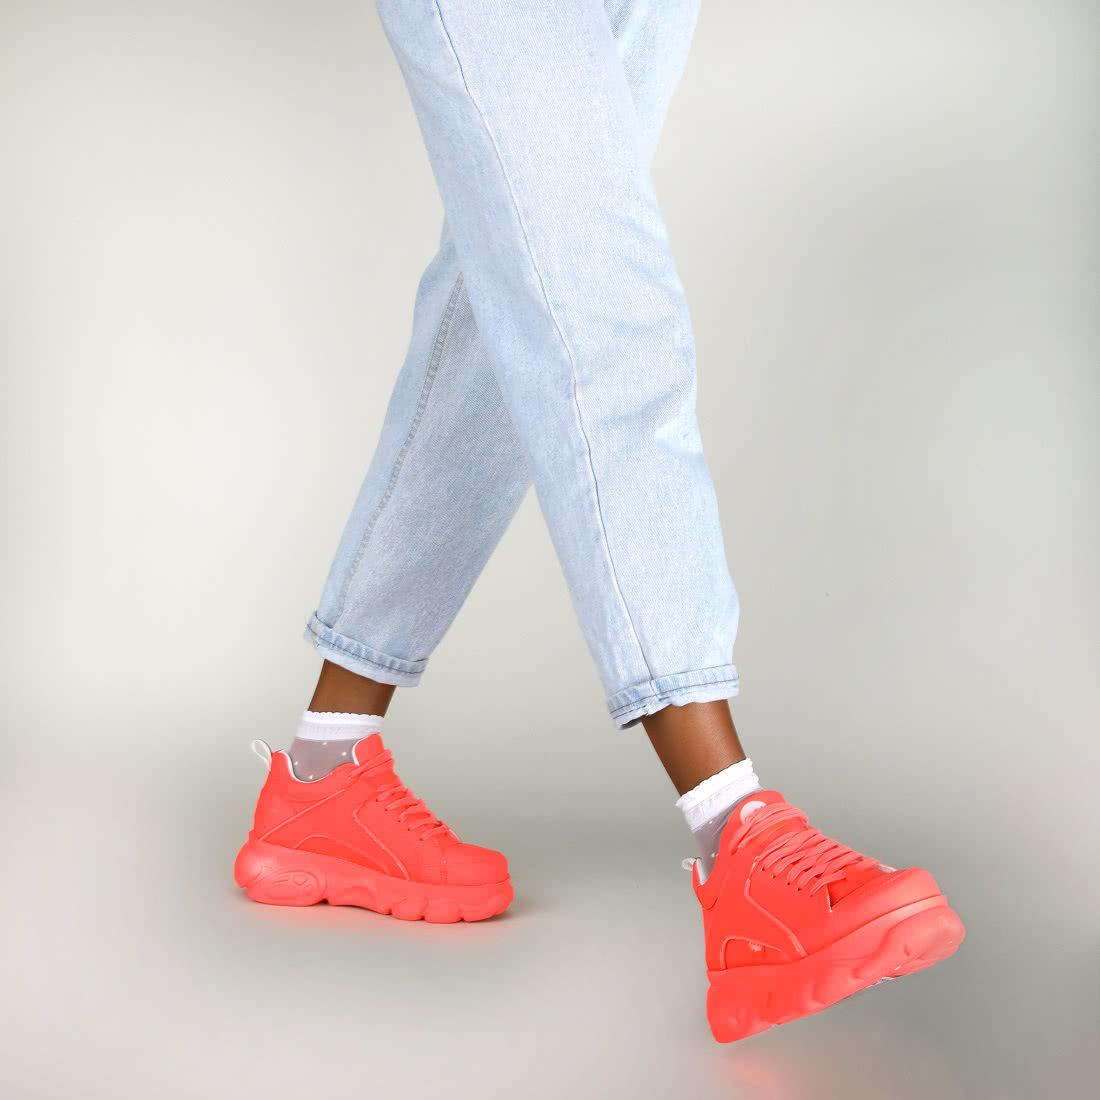 Neon Orange Cld Corin Corin Cld Sneaker nXN8wOk0P